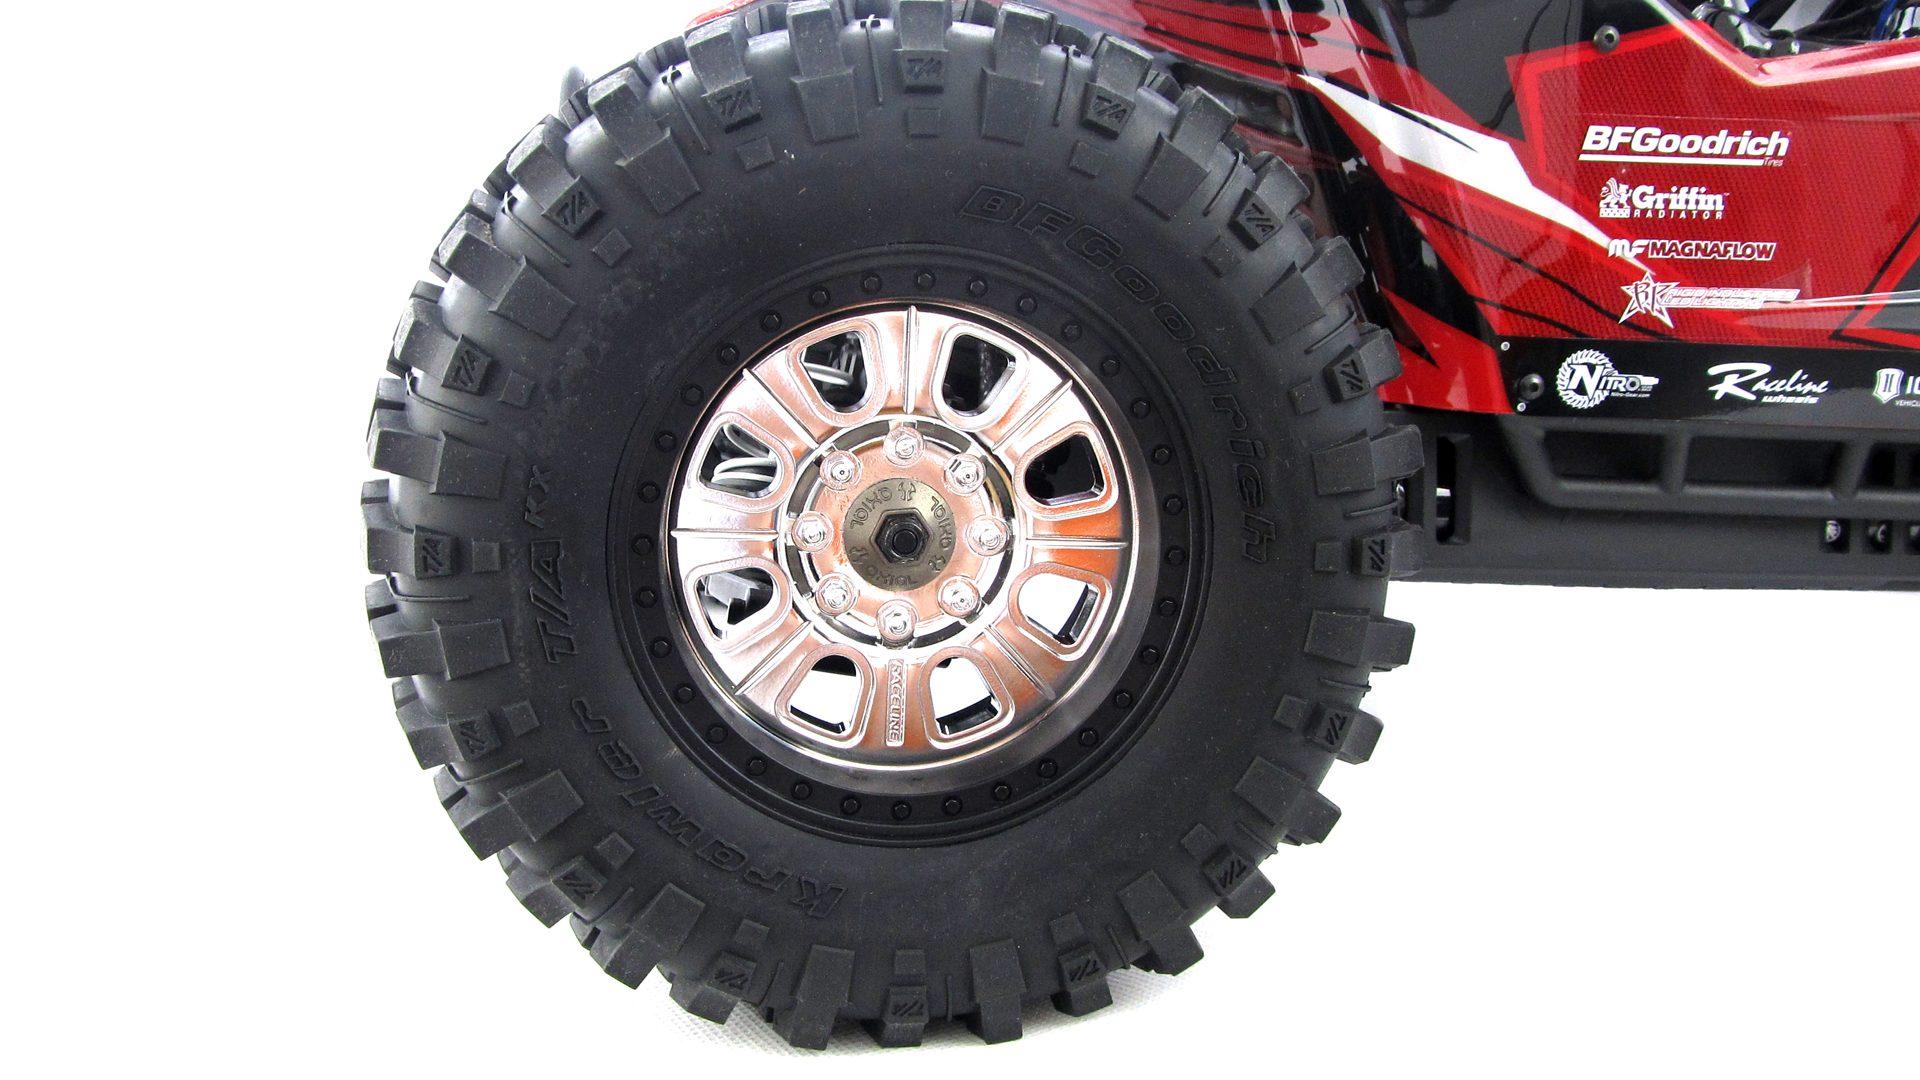 Yeti-Reifen-Motor-Aufhaengung_3